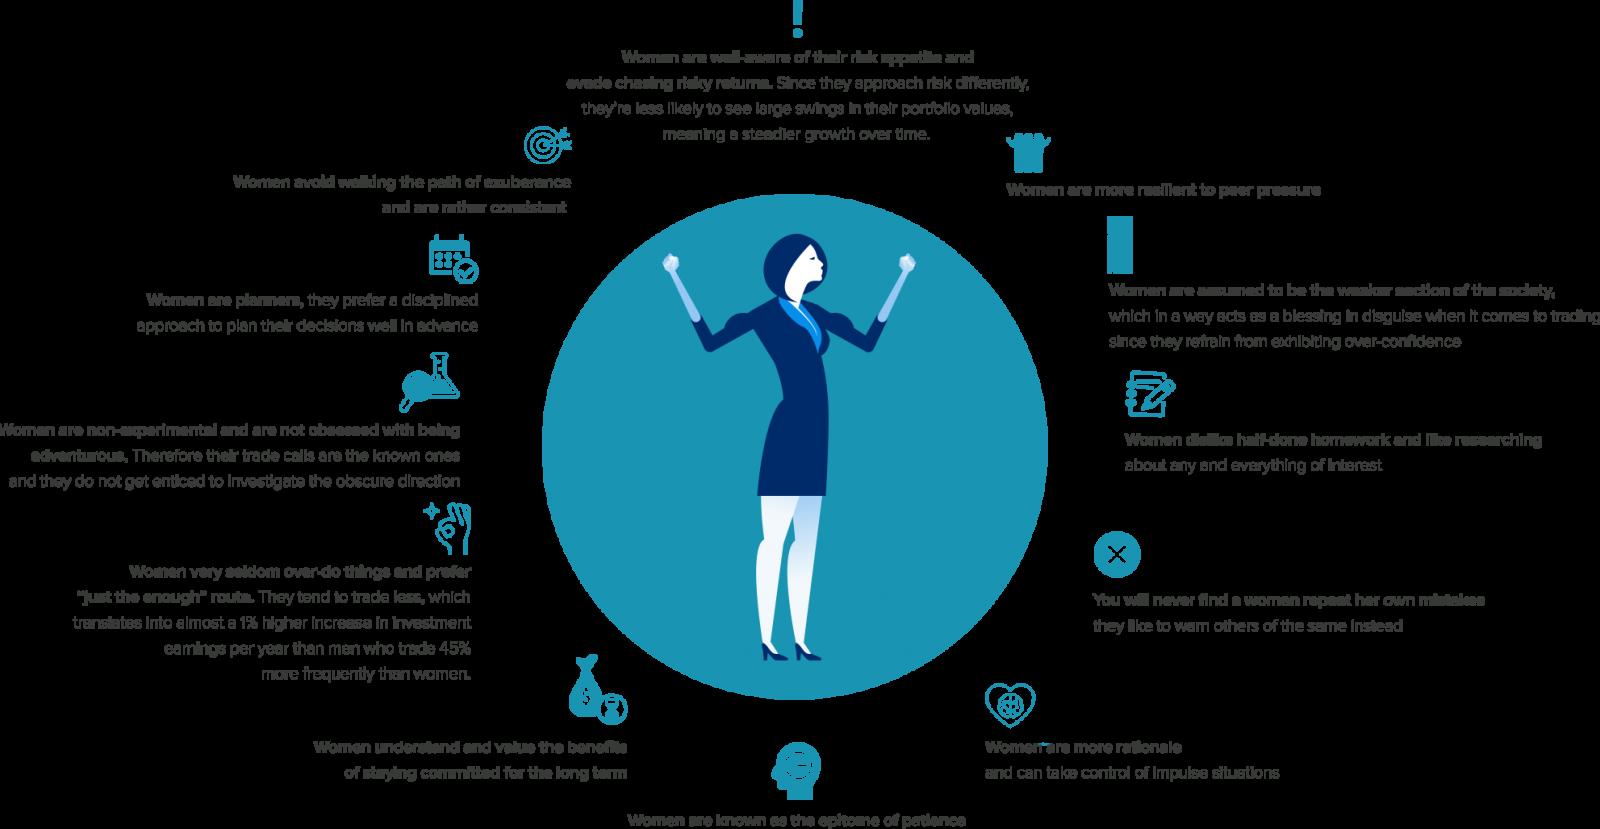 female investor benefits